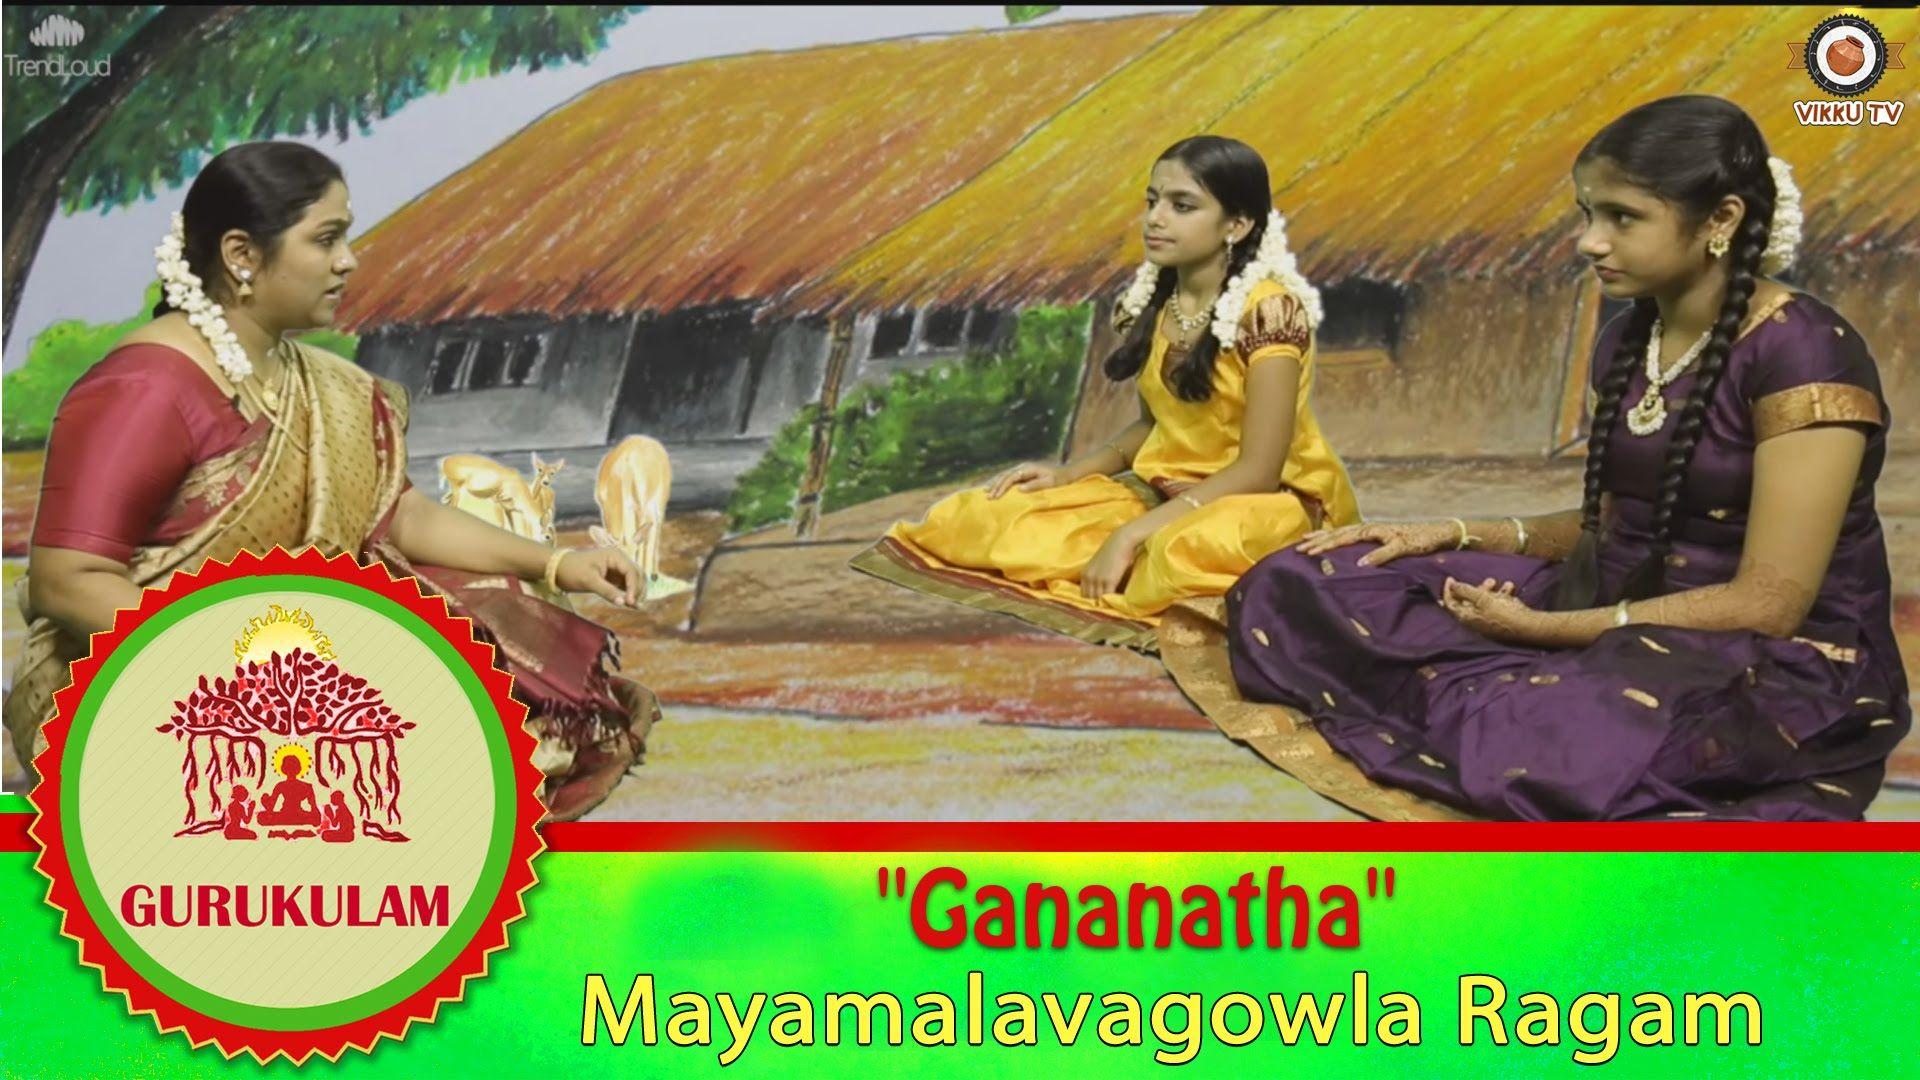 Gananatha - Mayamalavagowla Ragam | Gurukulam Episode 22